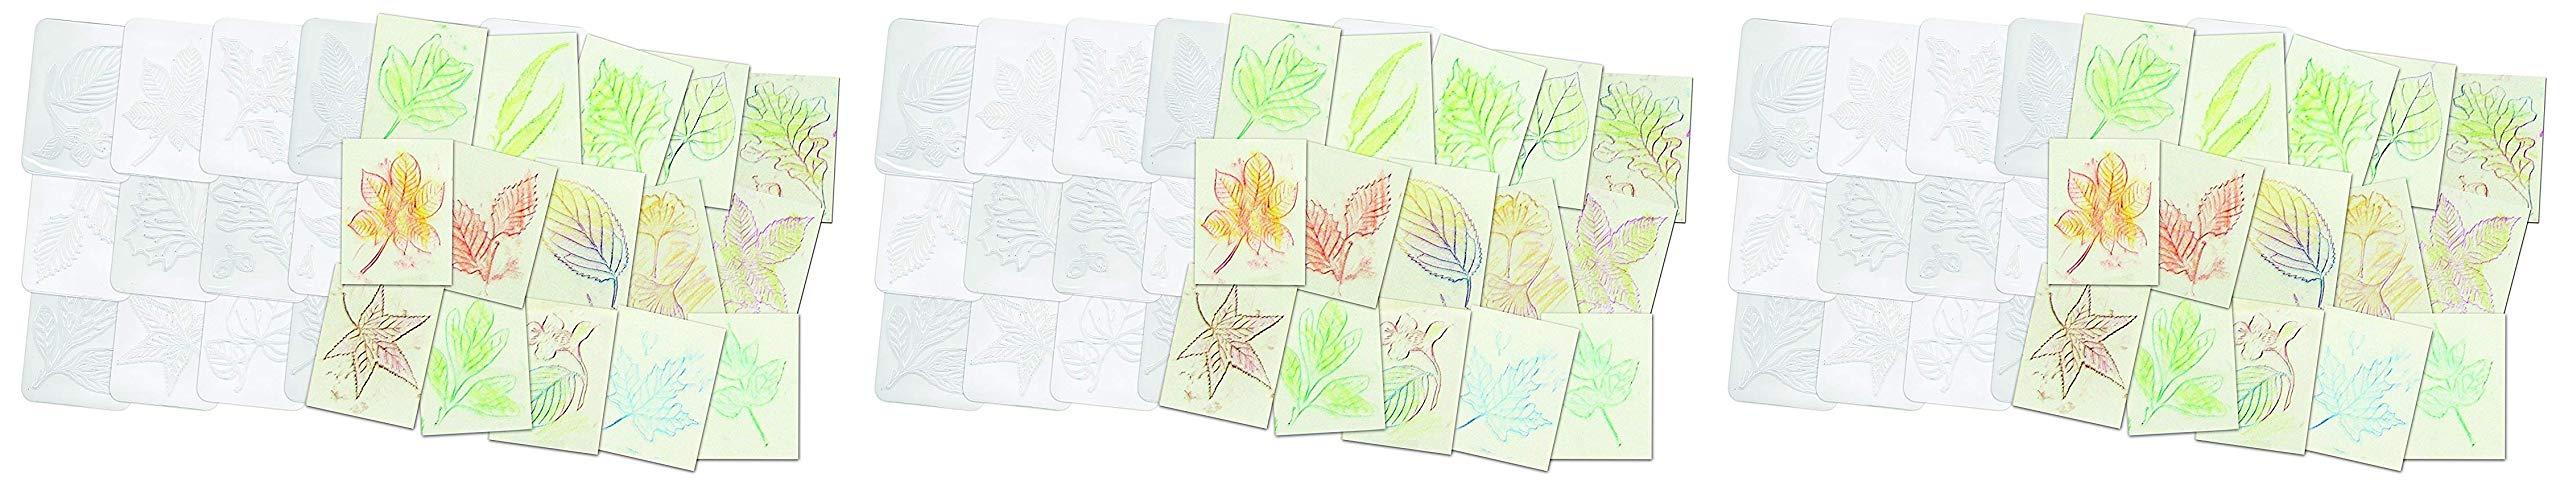 Roylco Leaf Rubbing Plates (Тhrее Расk) by Roylco